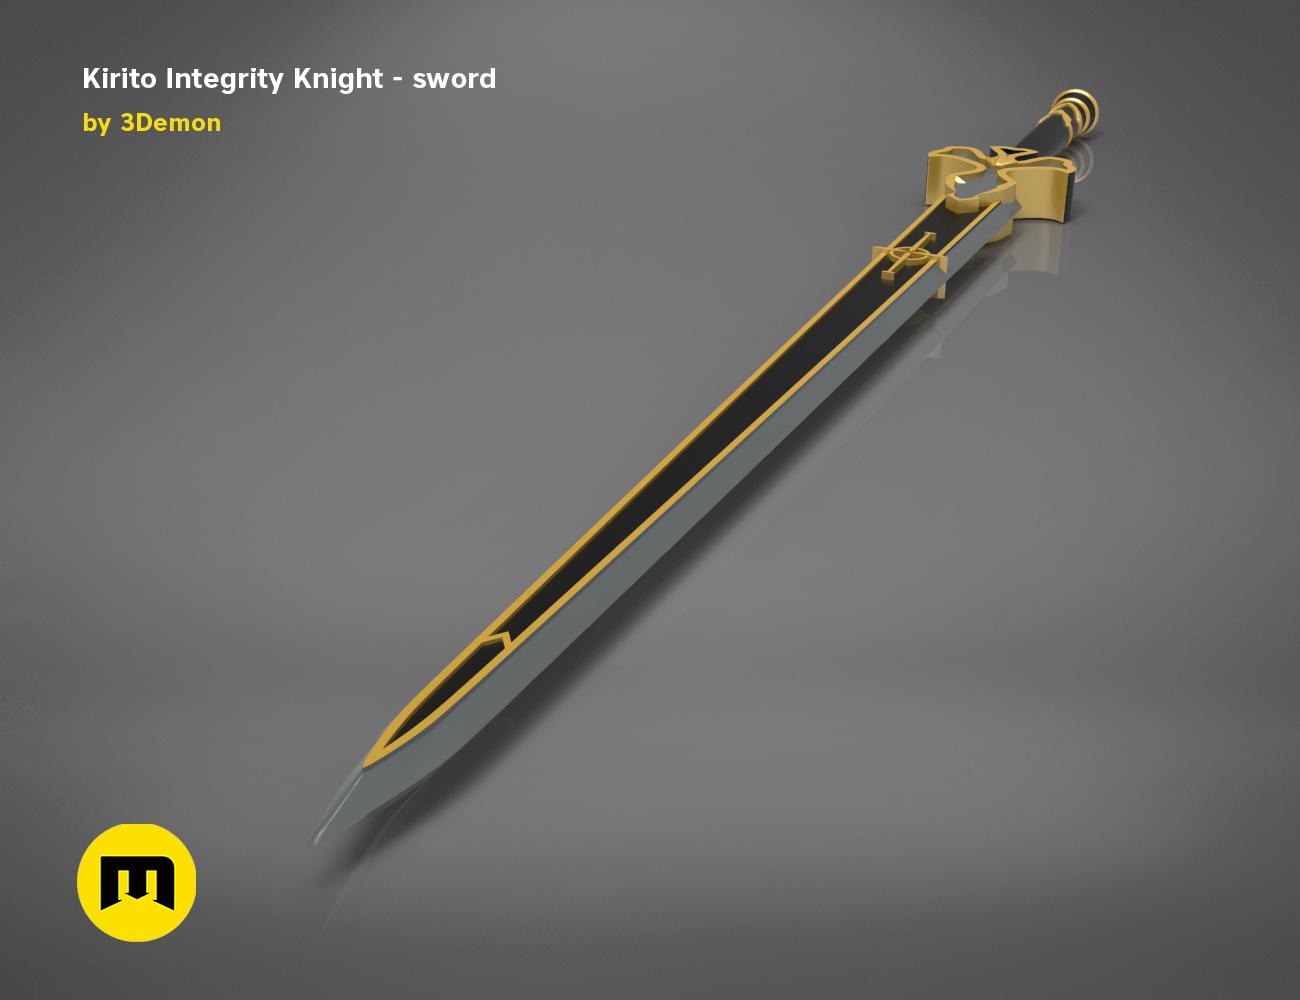 render_scene_Integrity-knight-sword.11 kopie.jpg Download STL file Kirito's Sword - Integrity Knight • 3D print model, 3D-mon